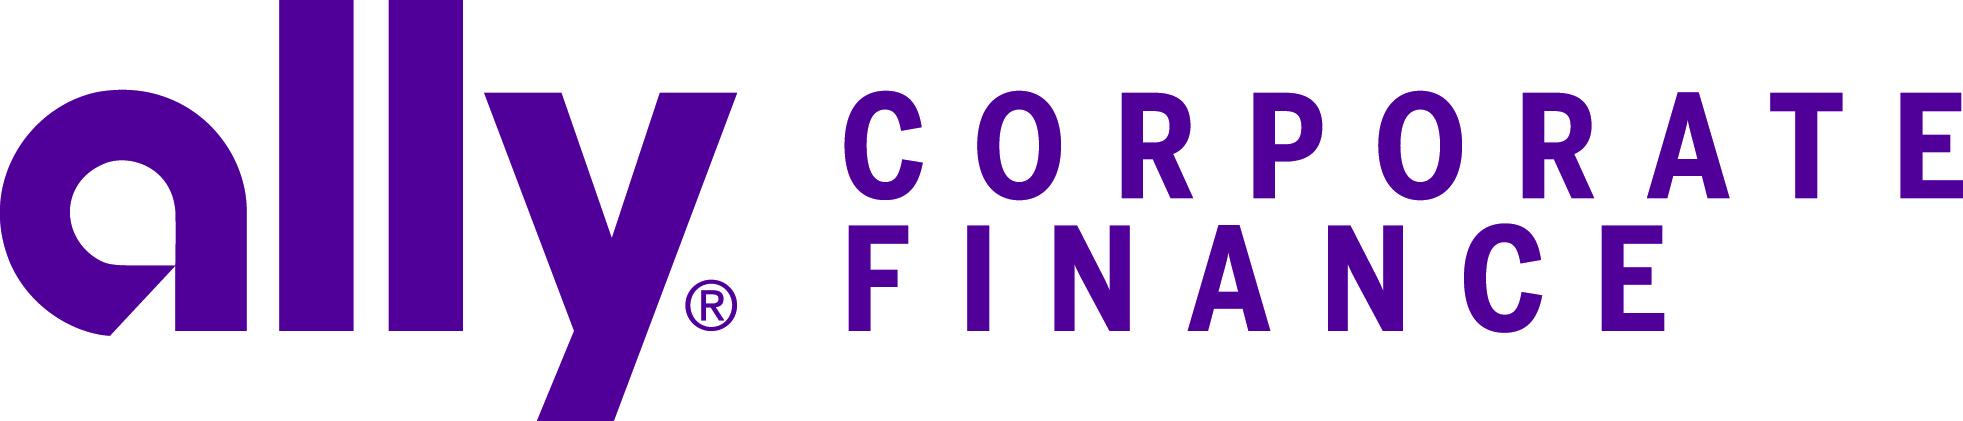 Ally-CF Corporate_Finance_Logo (002)